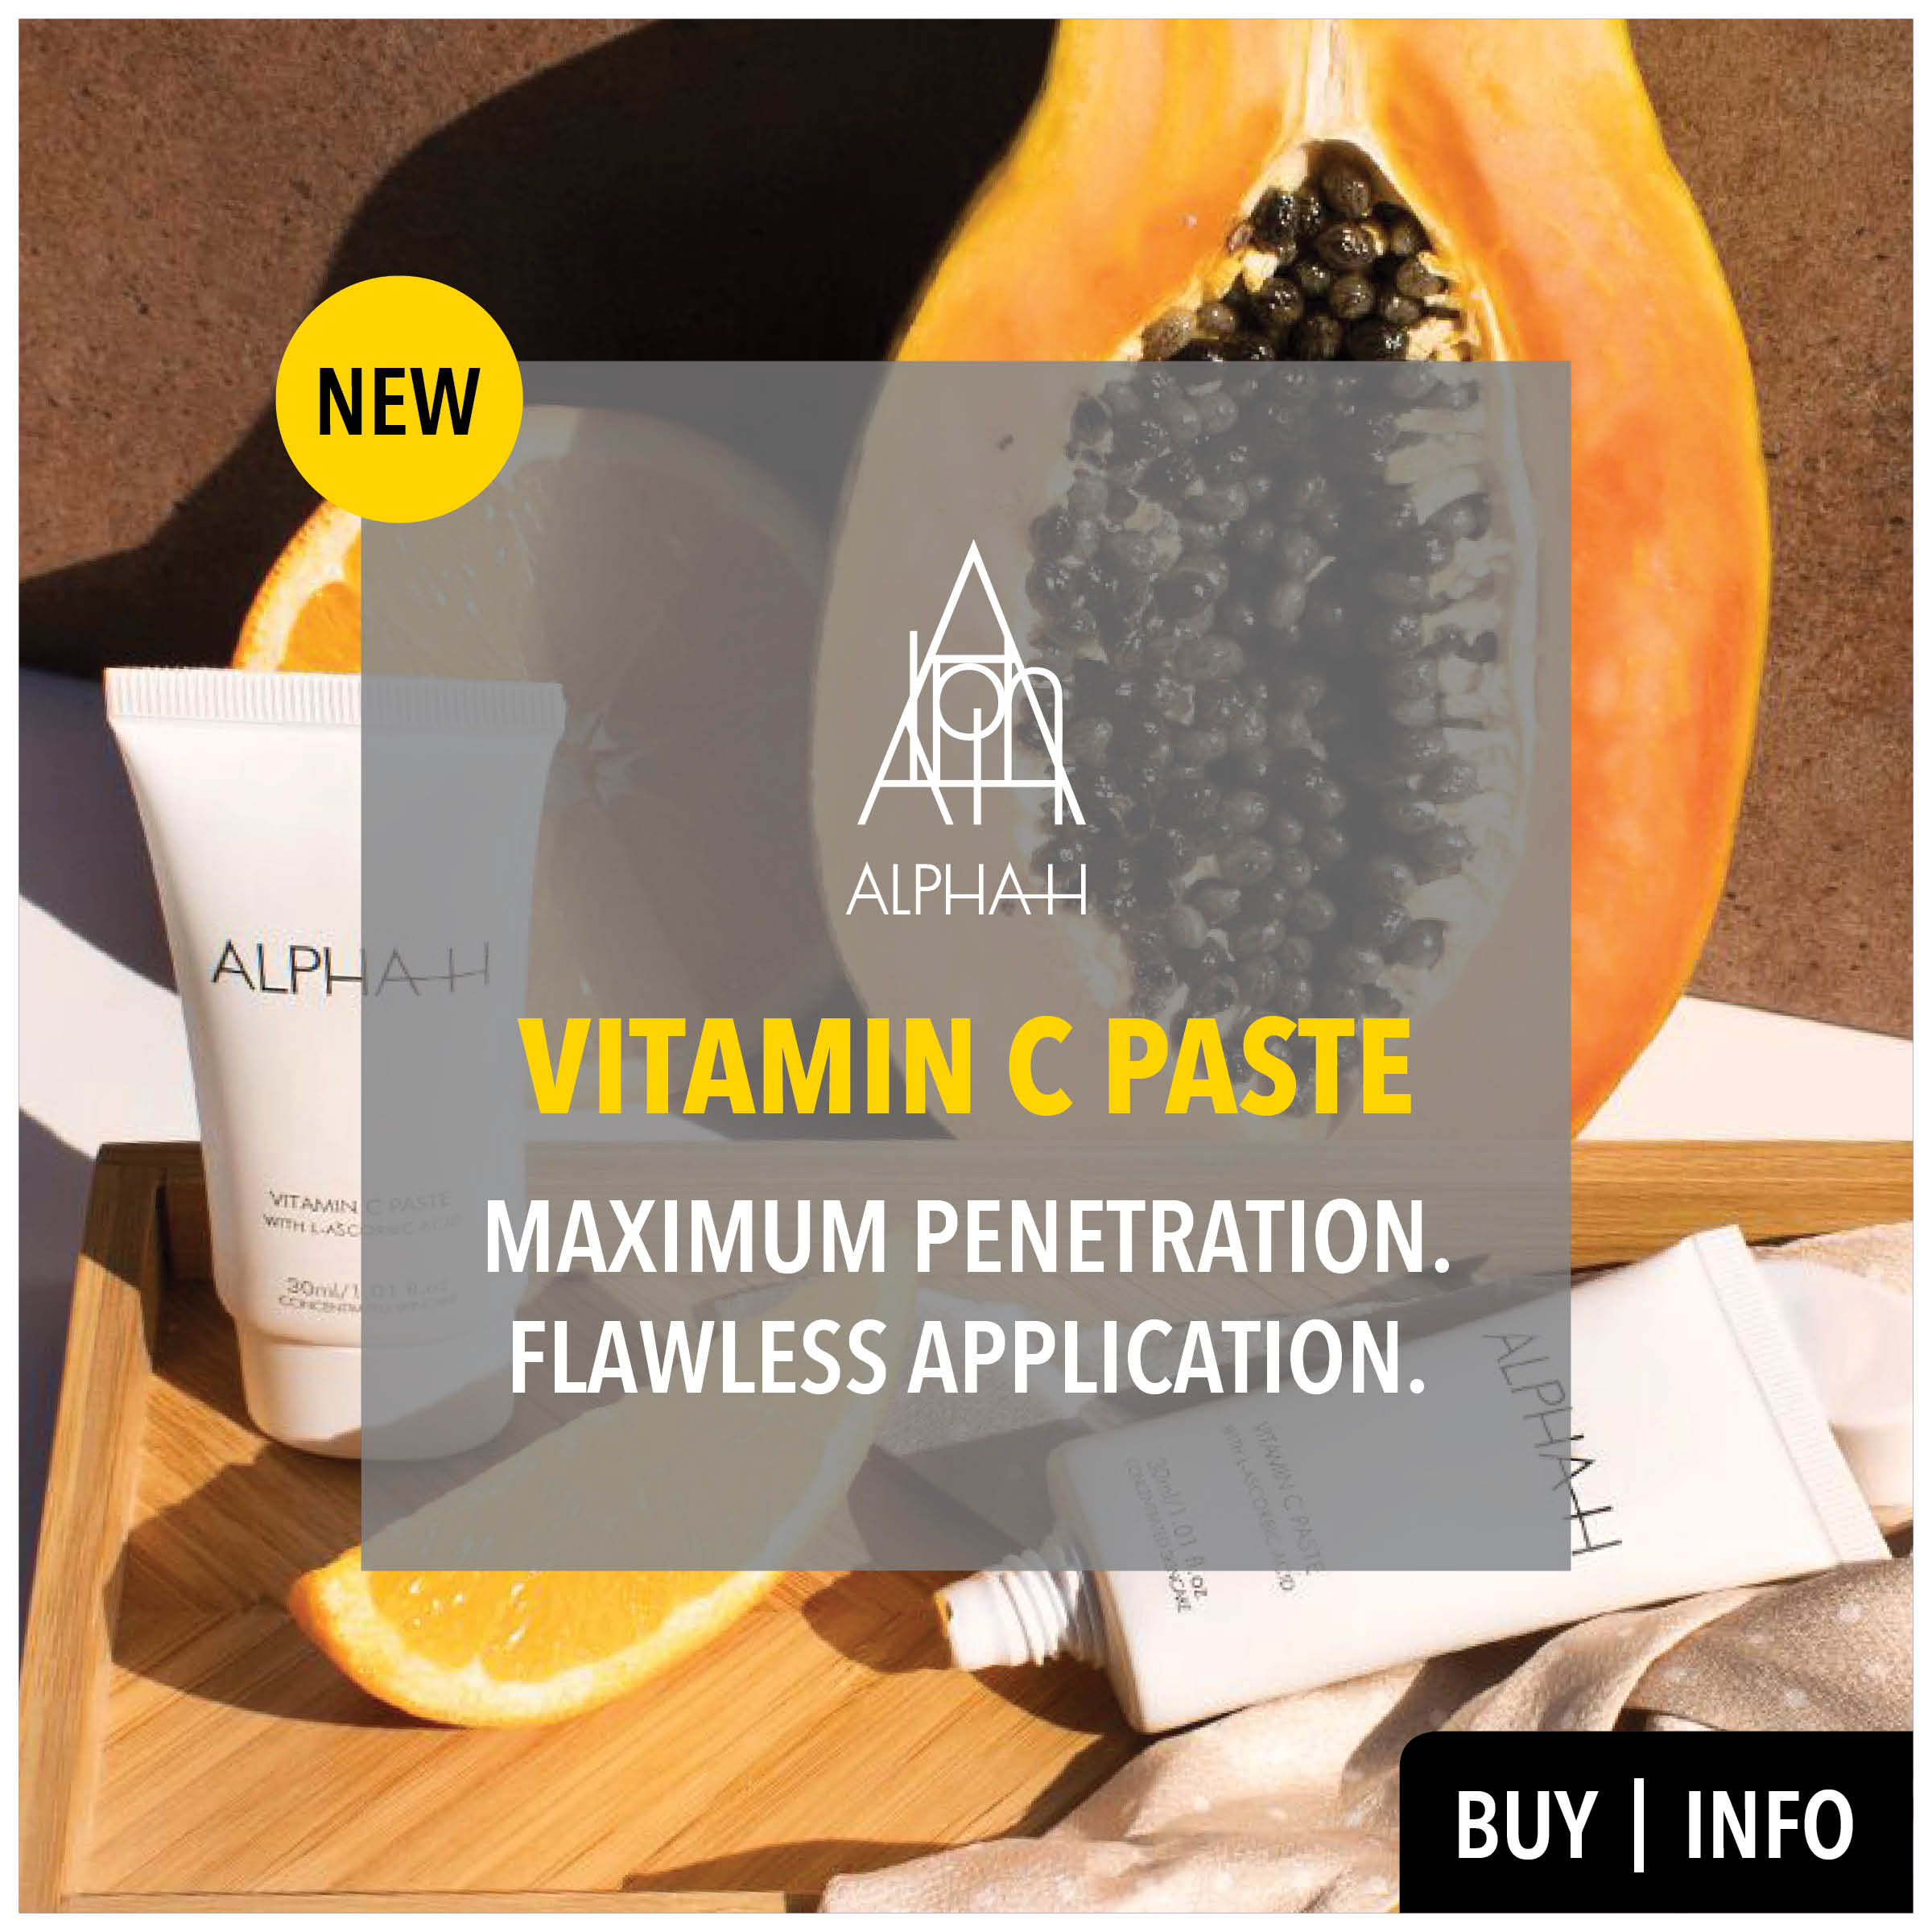 new alpha-h vitamin c paste from prodermal